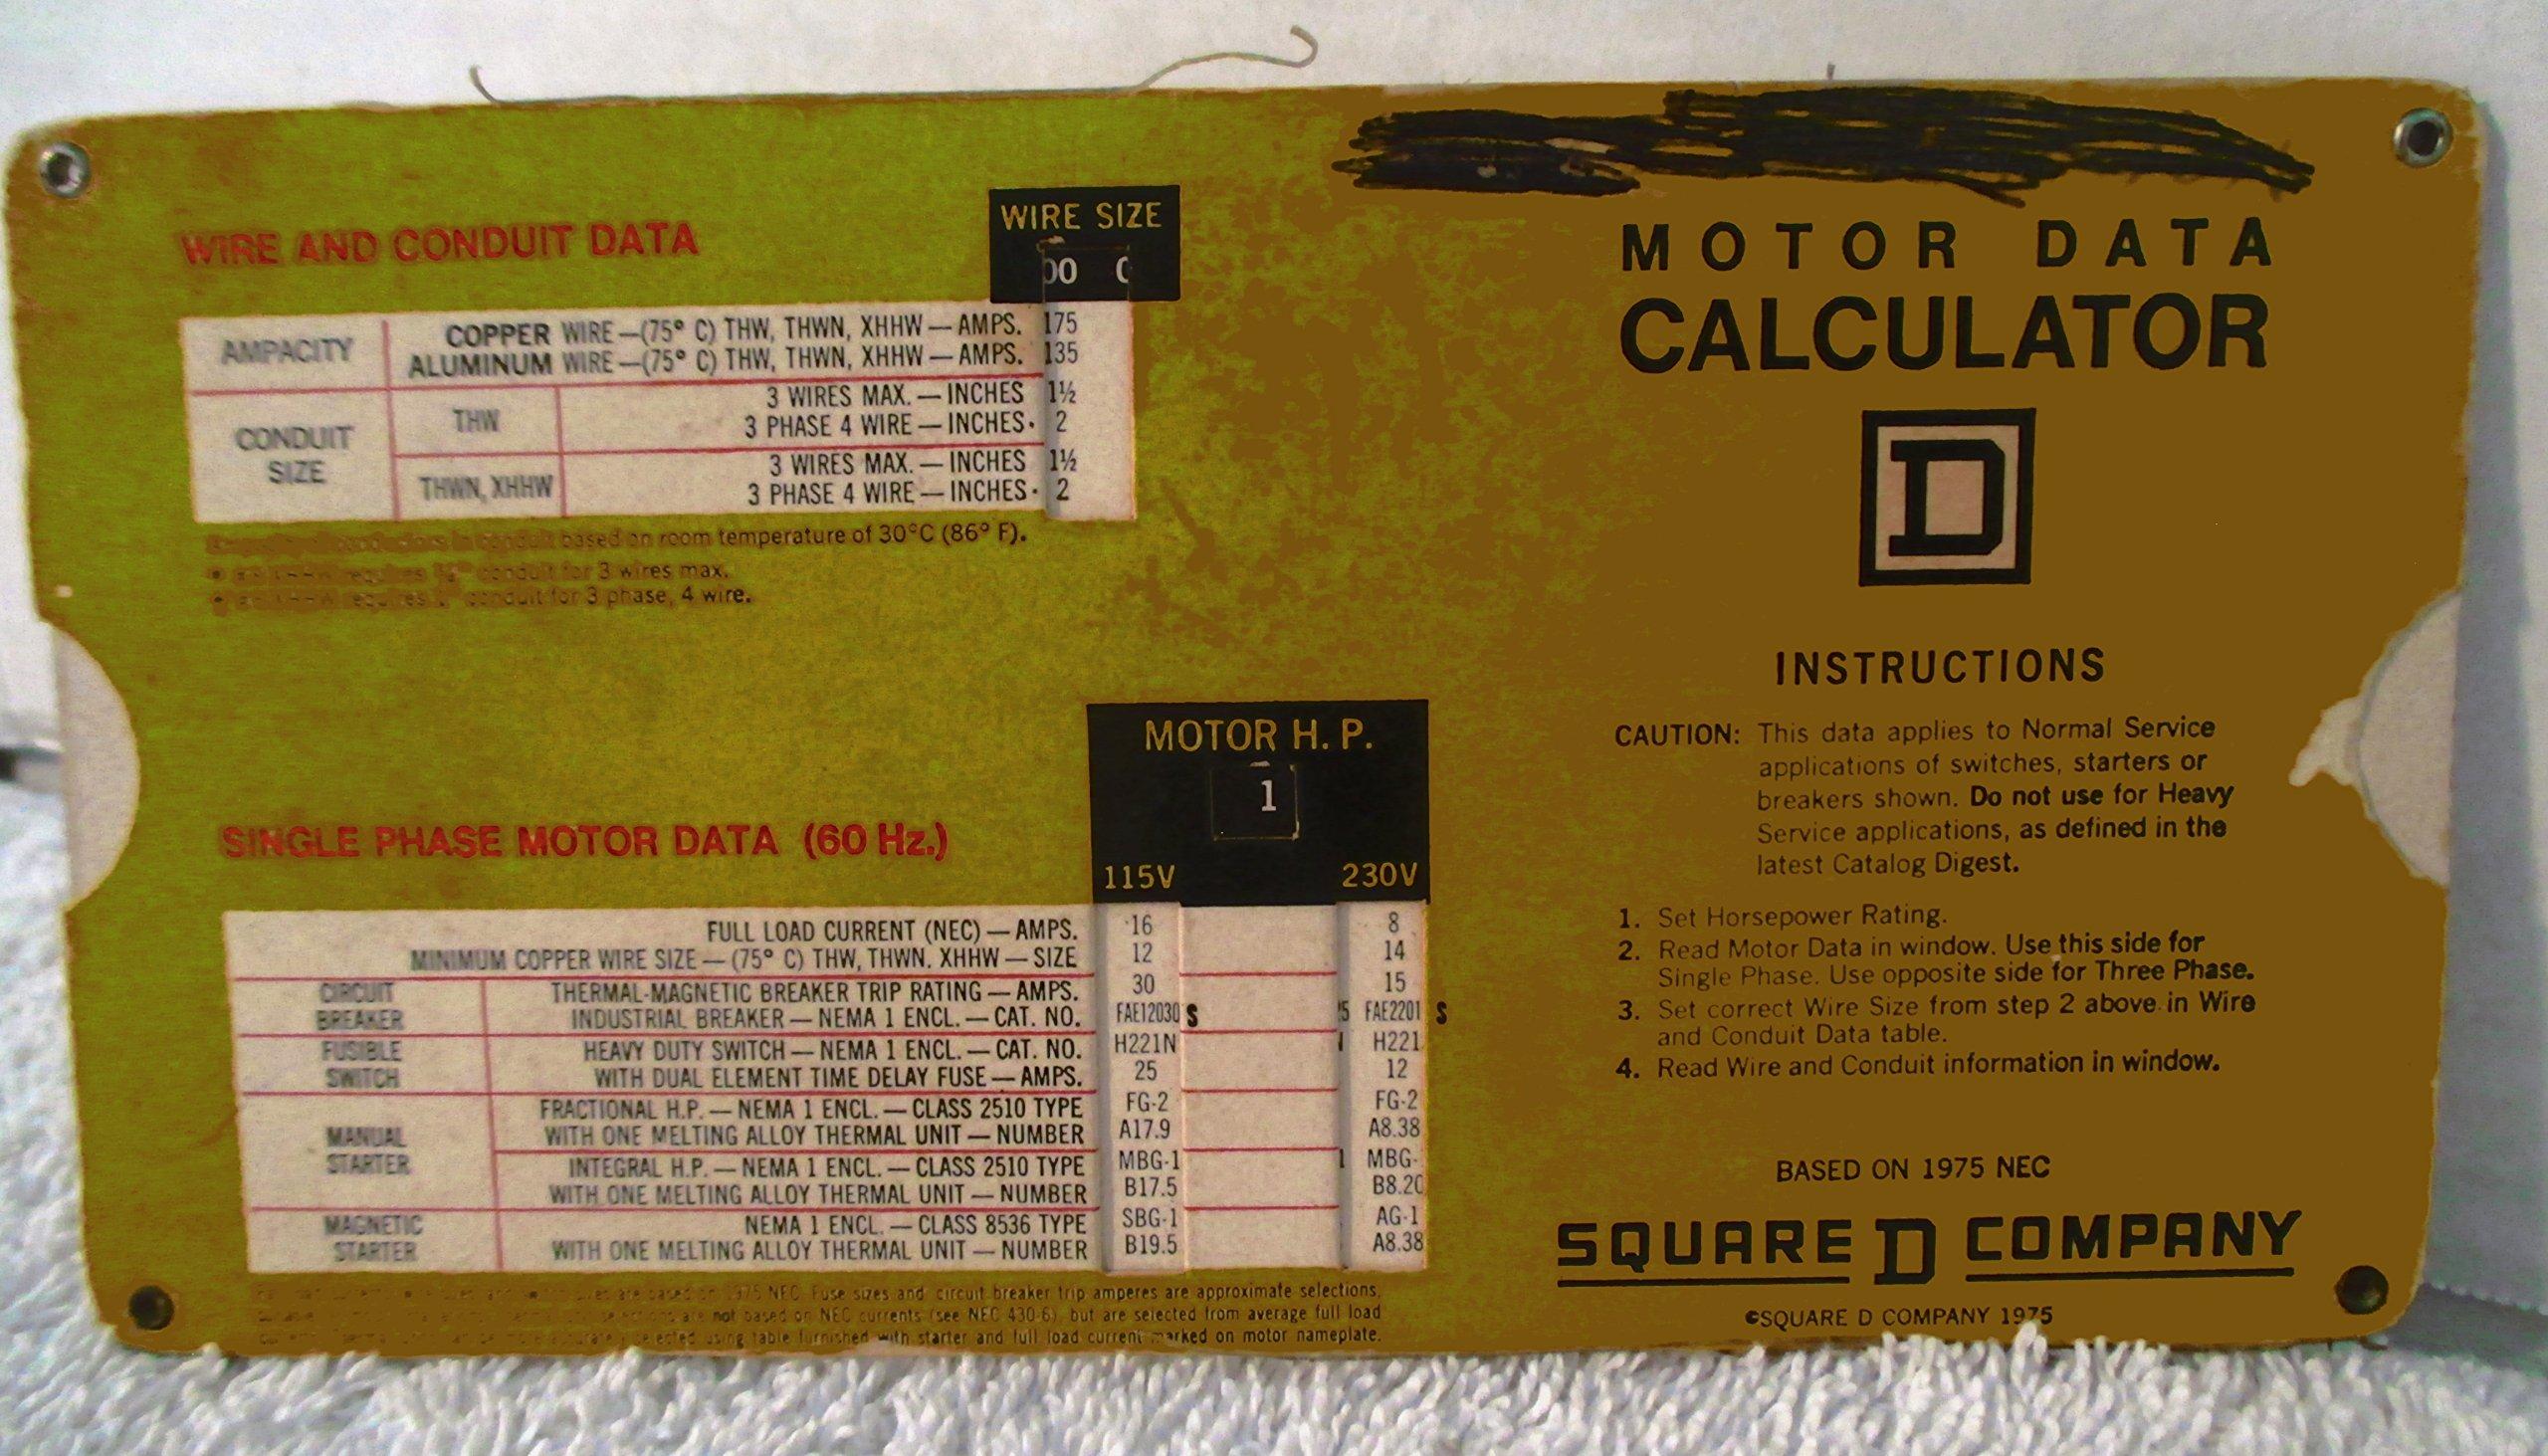 1975 Motor Data Calculator Slide Card from Square D Single & Three